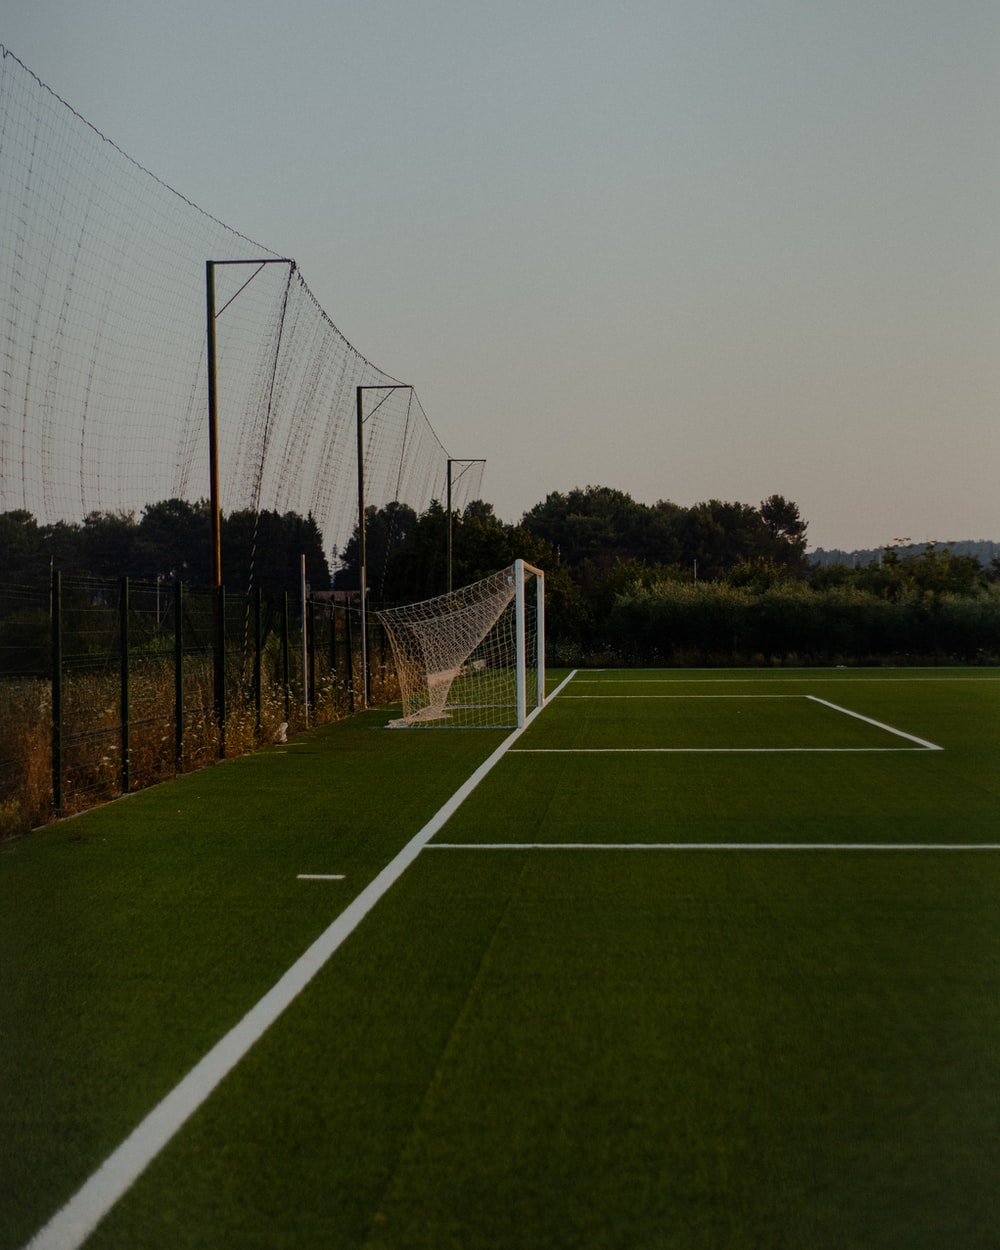 soccer goal net on green grass field during daytime